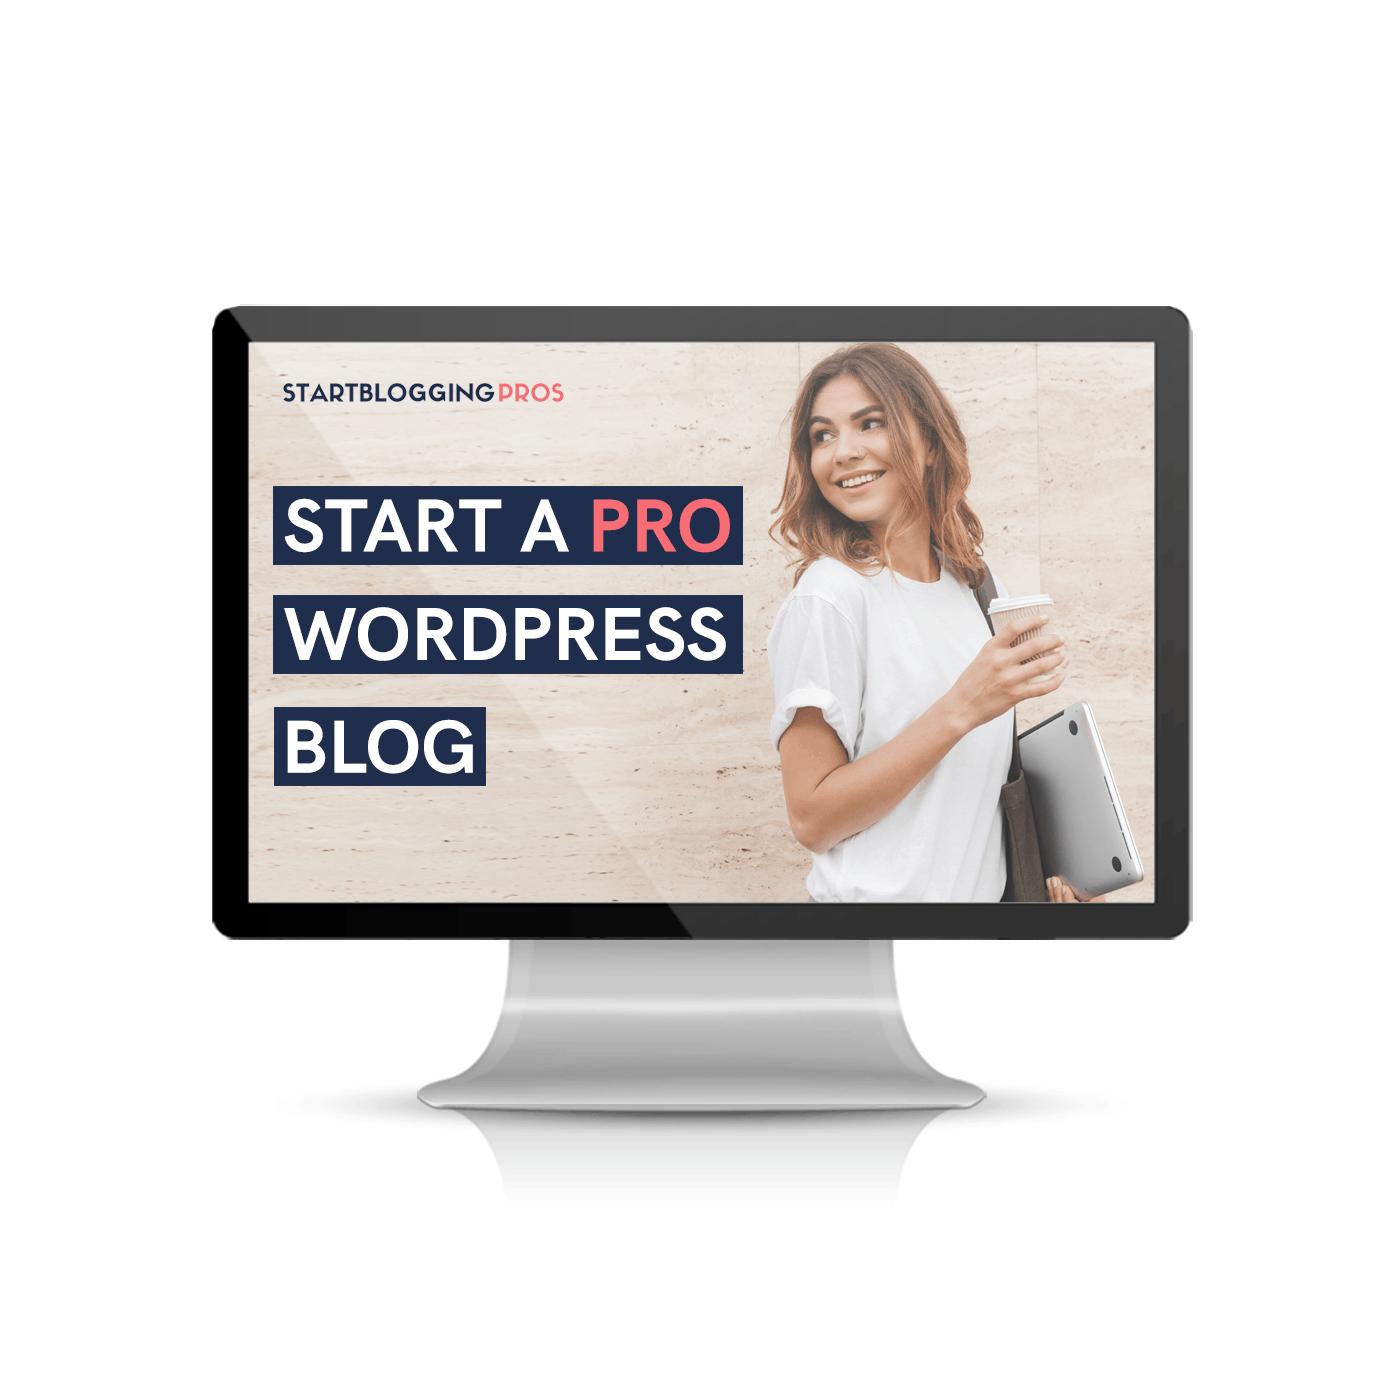 Premium And Free Blogging Courses, HerPaperRoute School 1